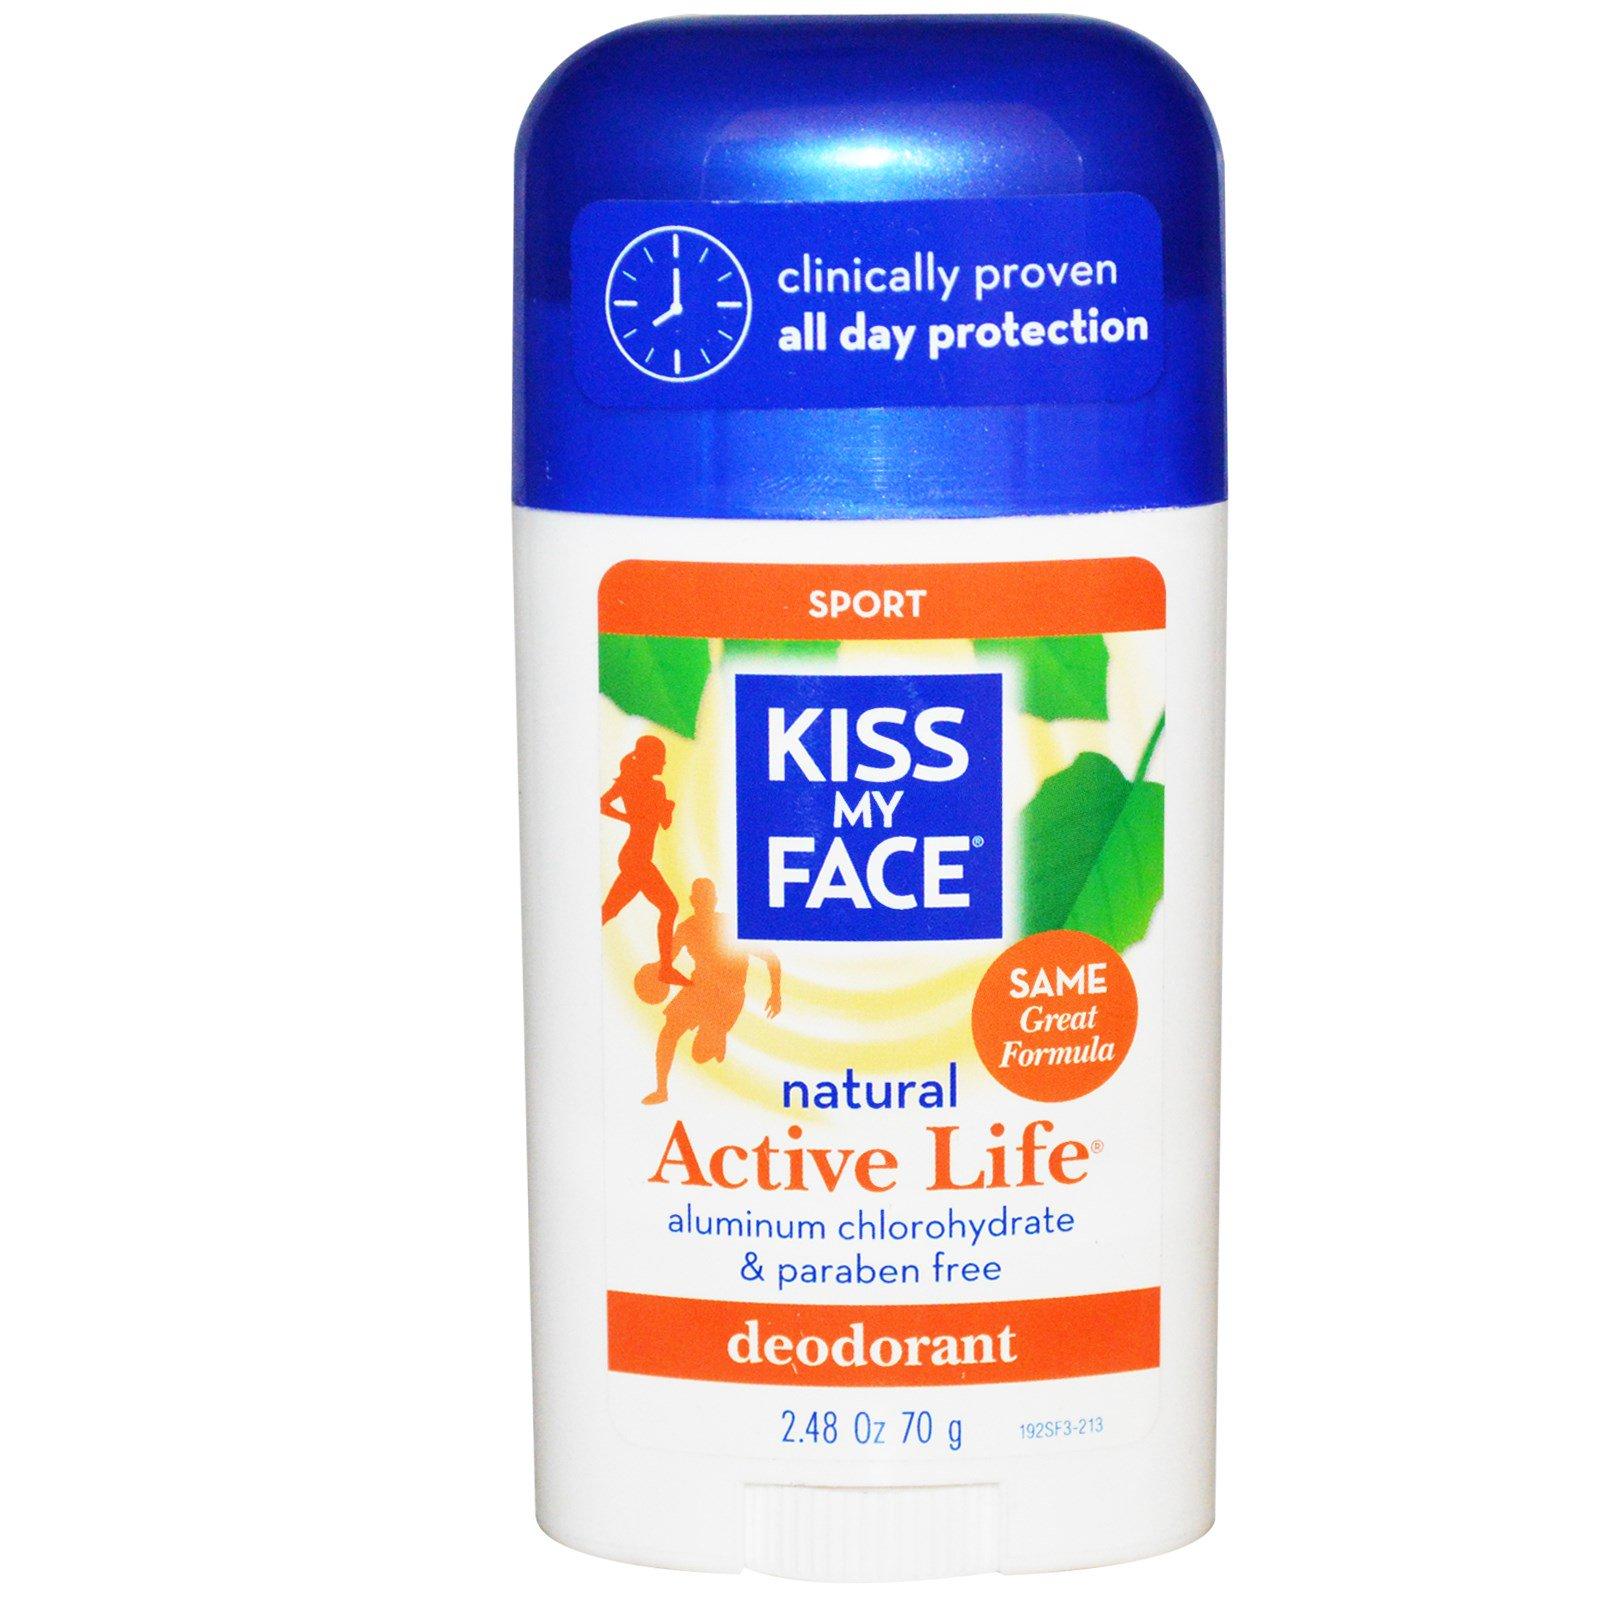 Kiss My Face, Active Life, дезодорант для спортсменов, 2.48 унций (70 г)